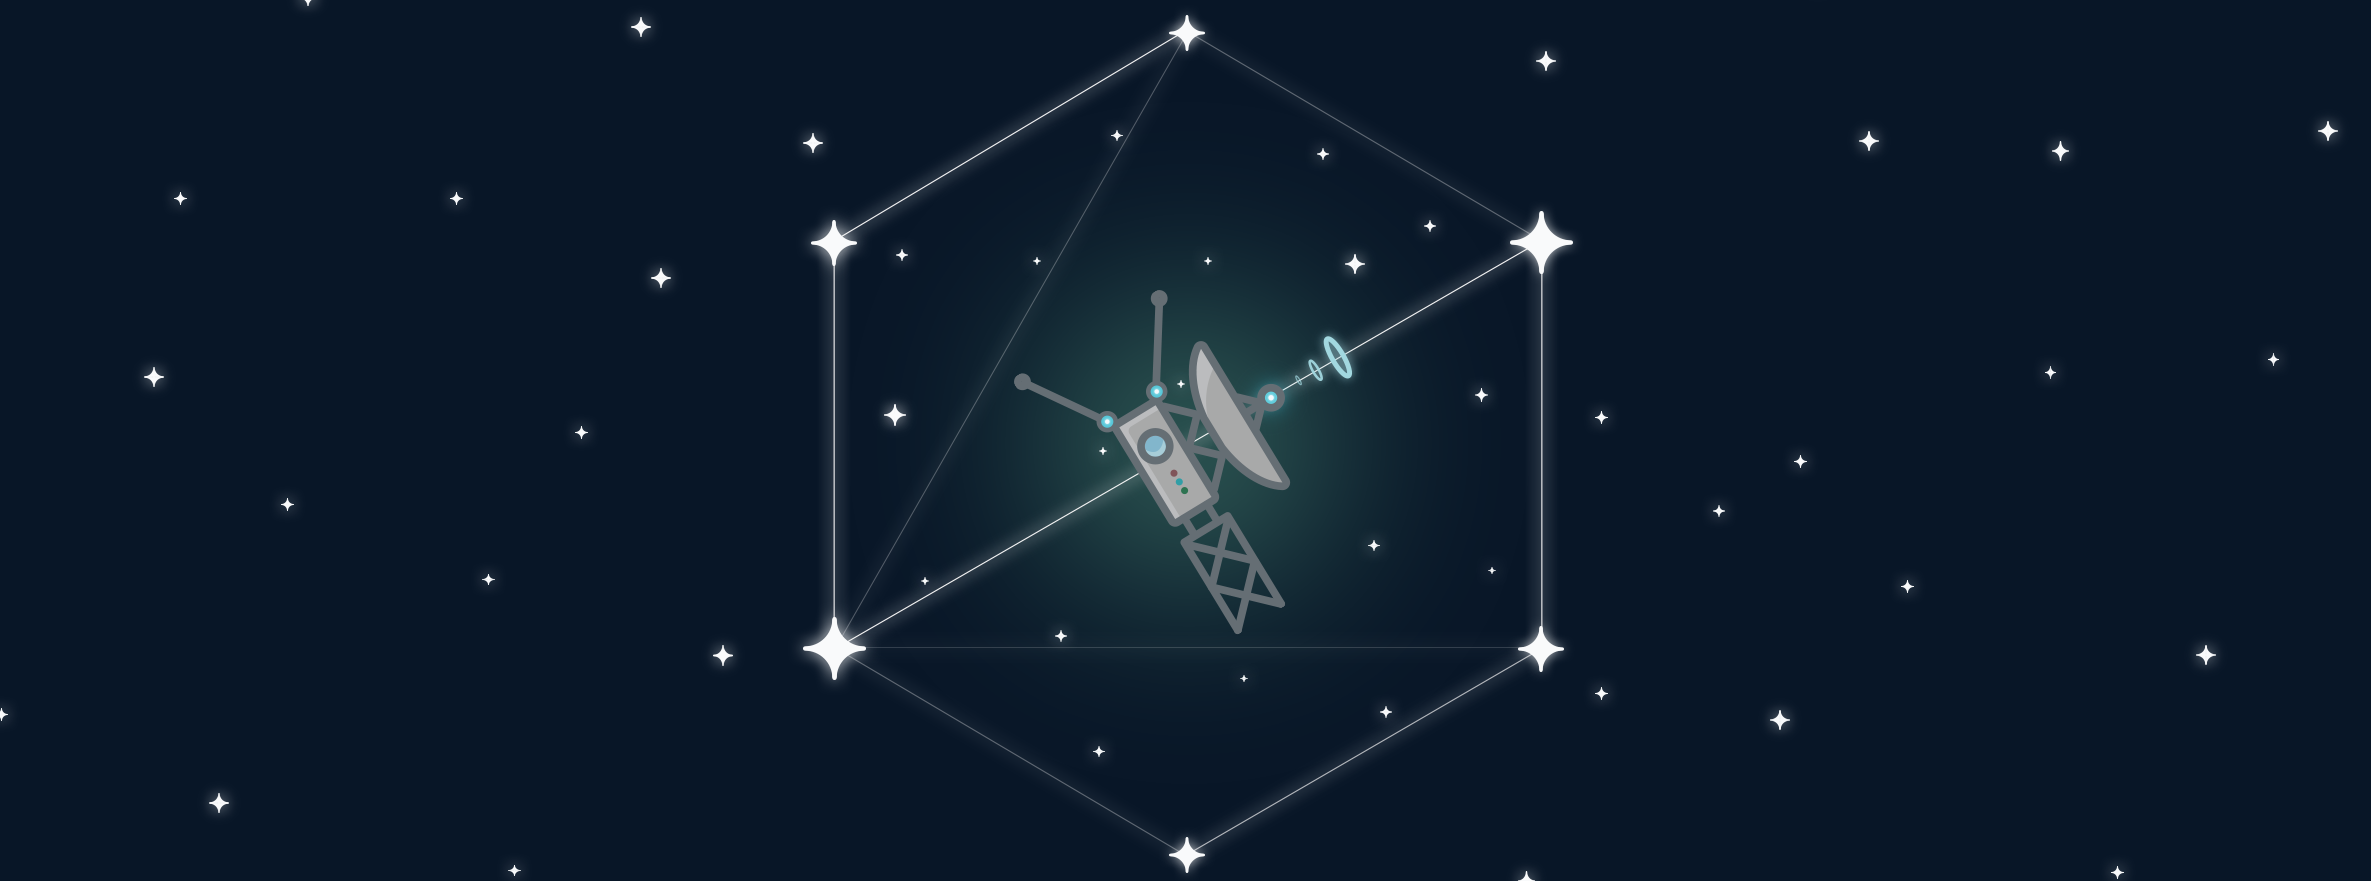 graphql-voyager logo